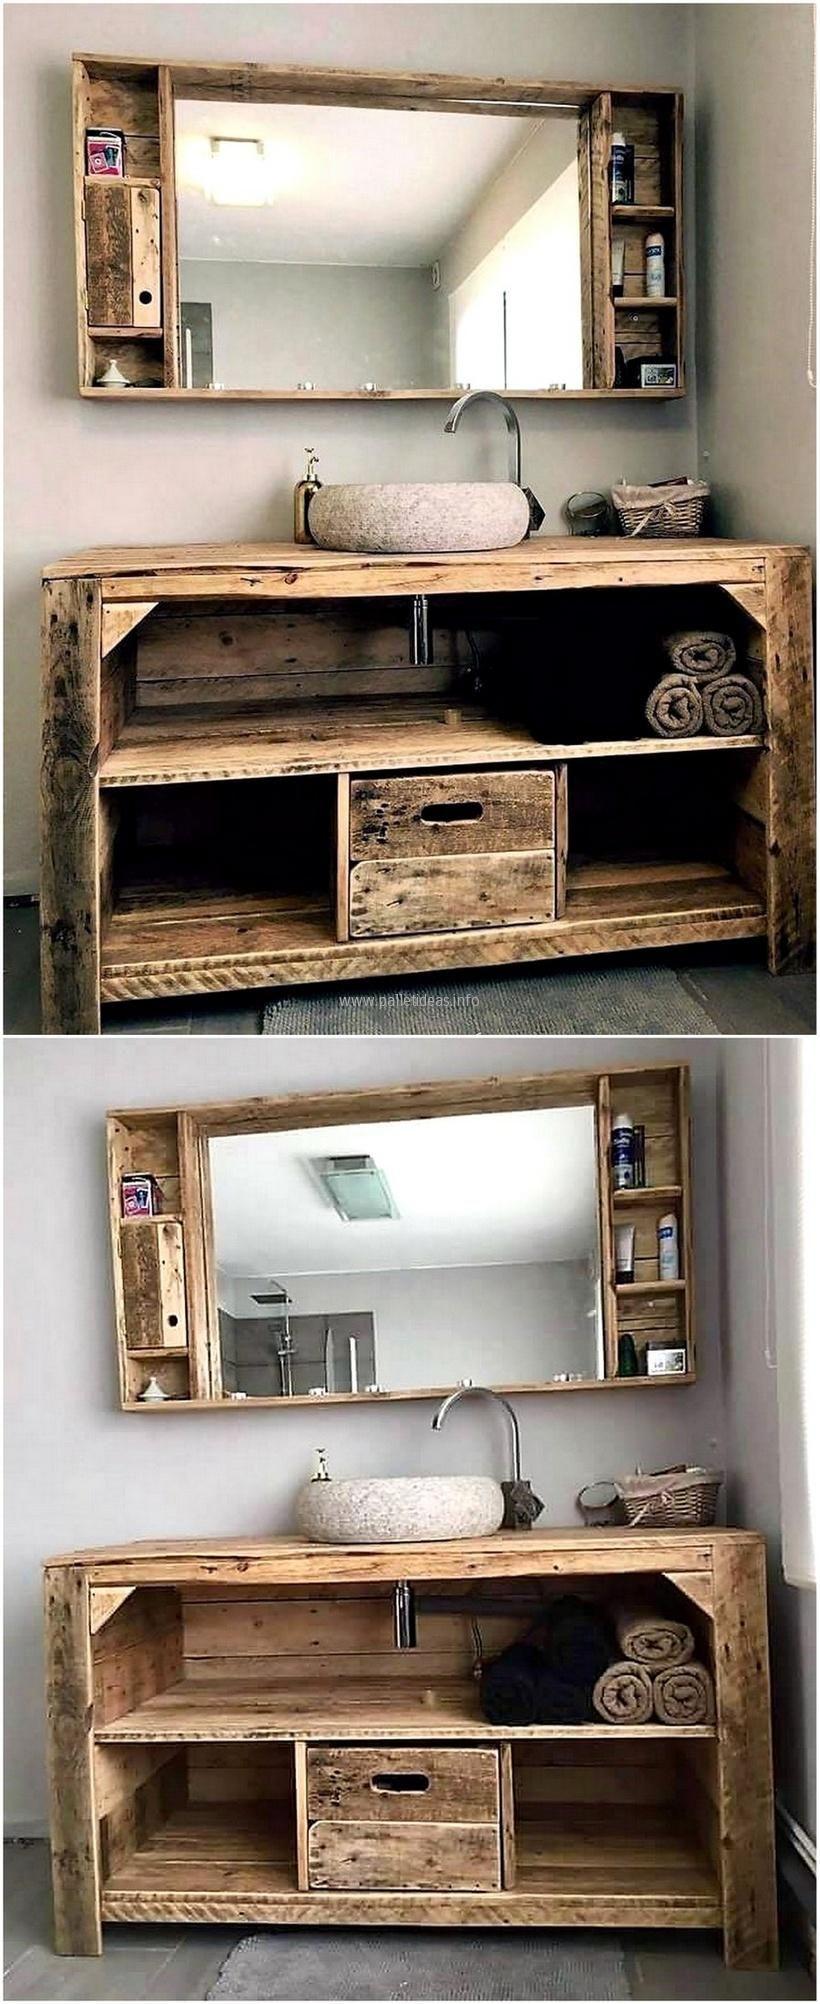 wood pallet sink and mirror   palets   Pinterest   Vintage holz, Diy ...